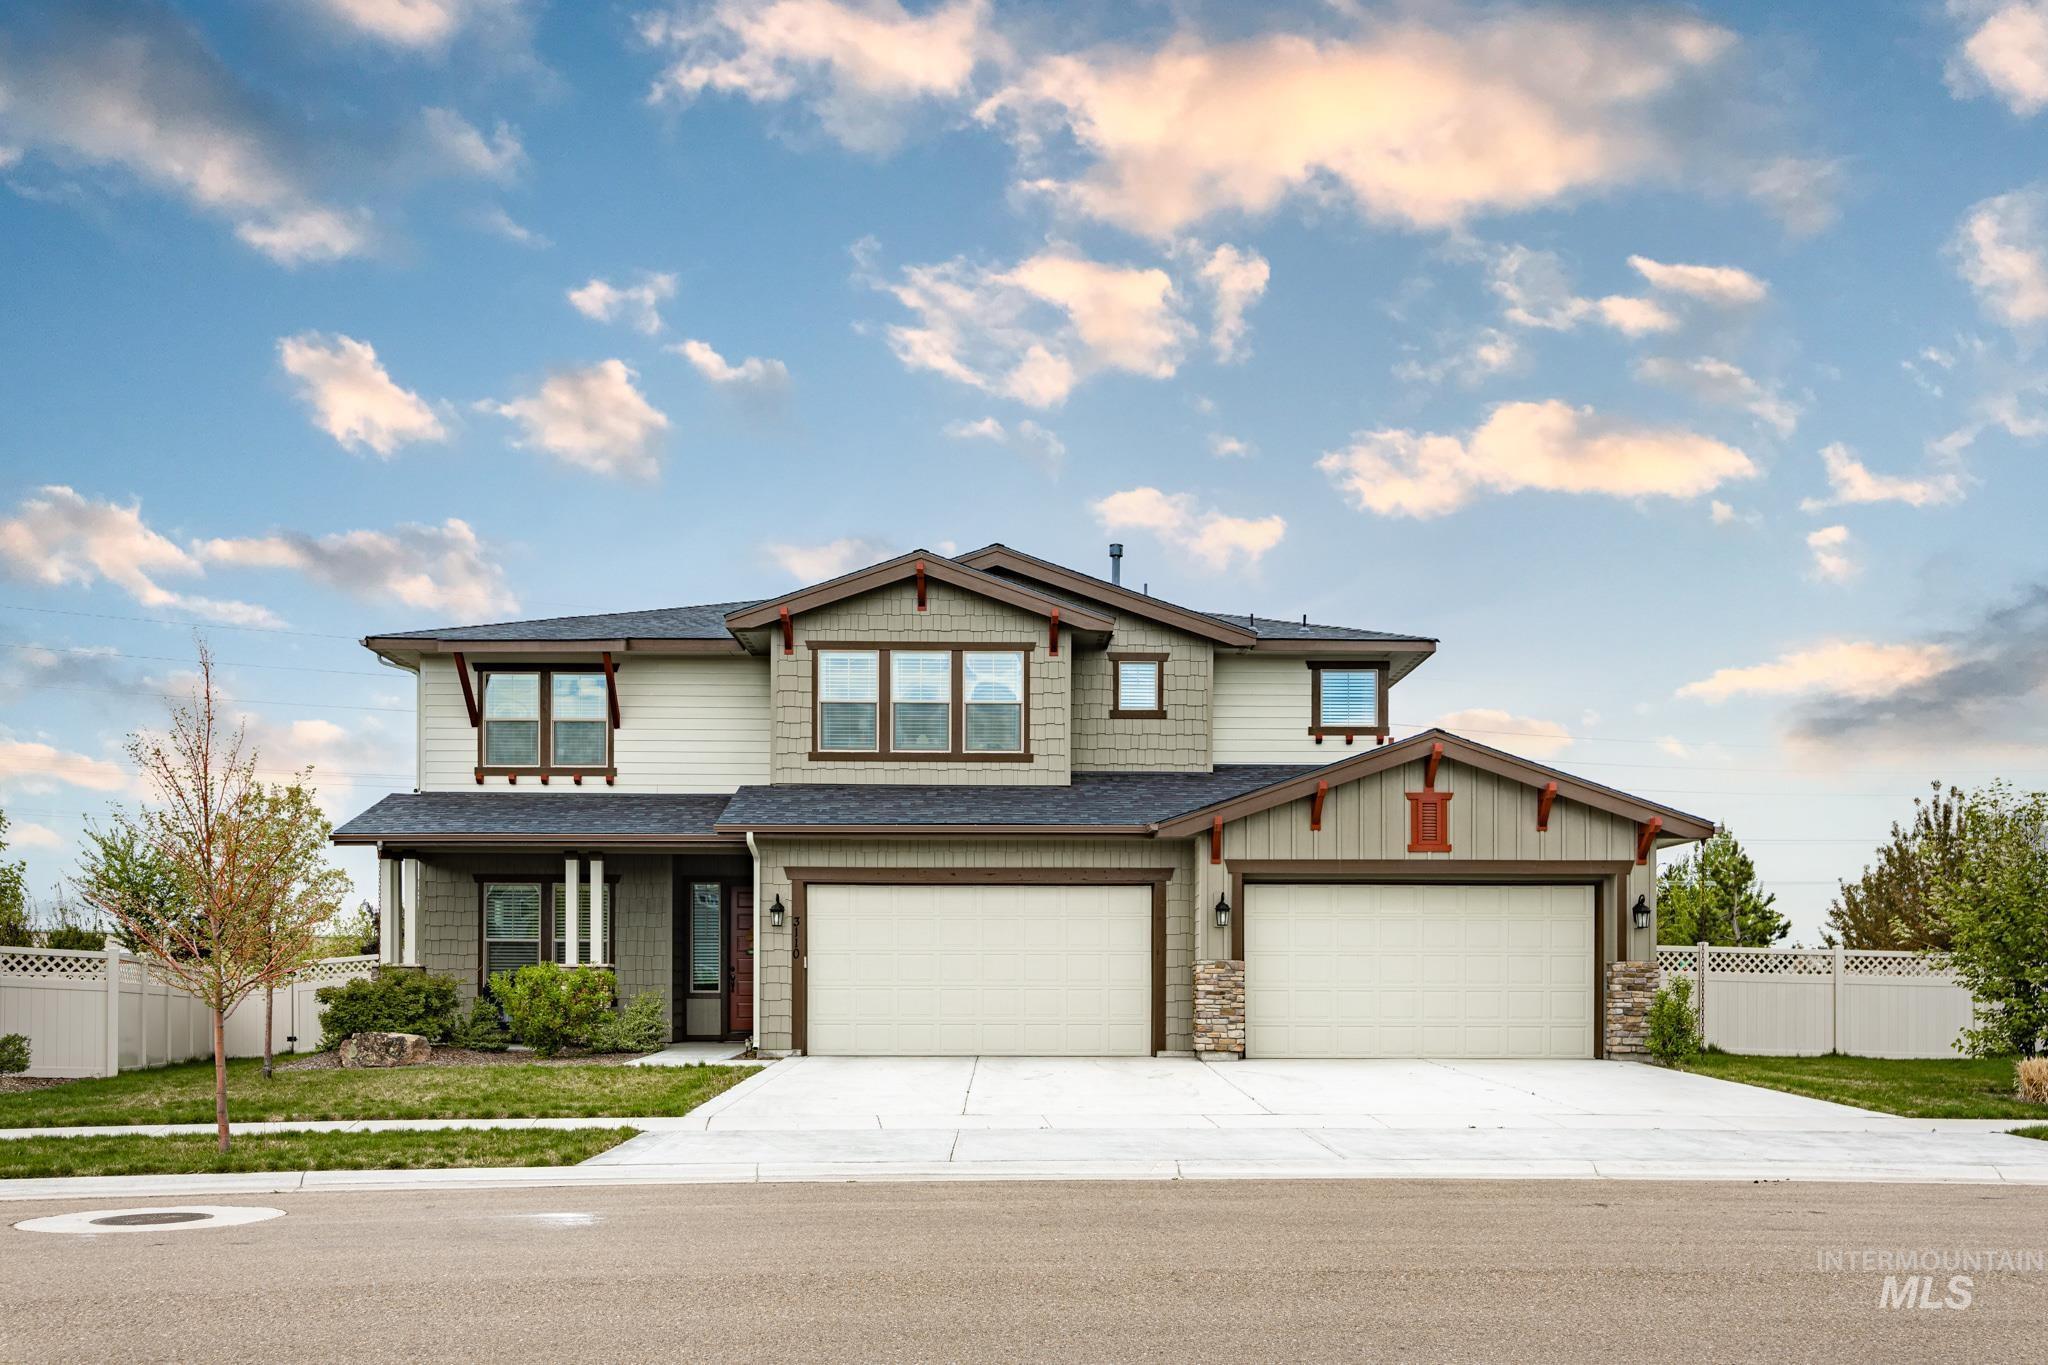 3110 W Alzano Dr Property Photo - Meridian, ID real estate listing